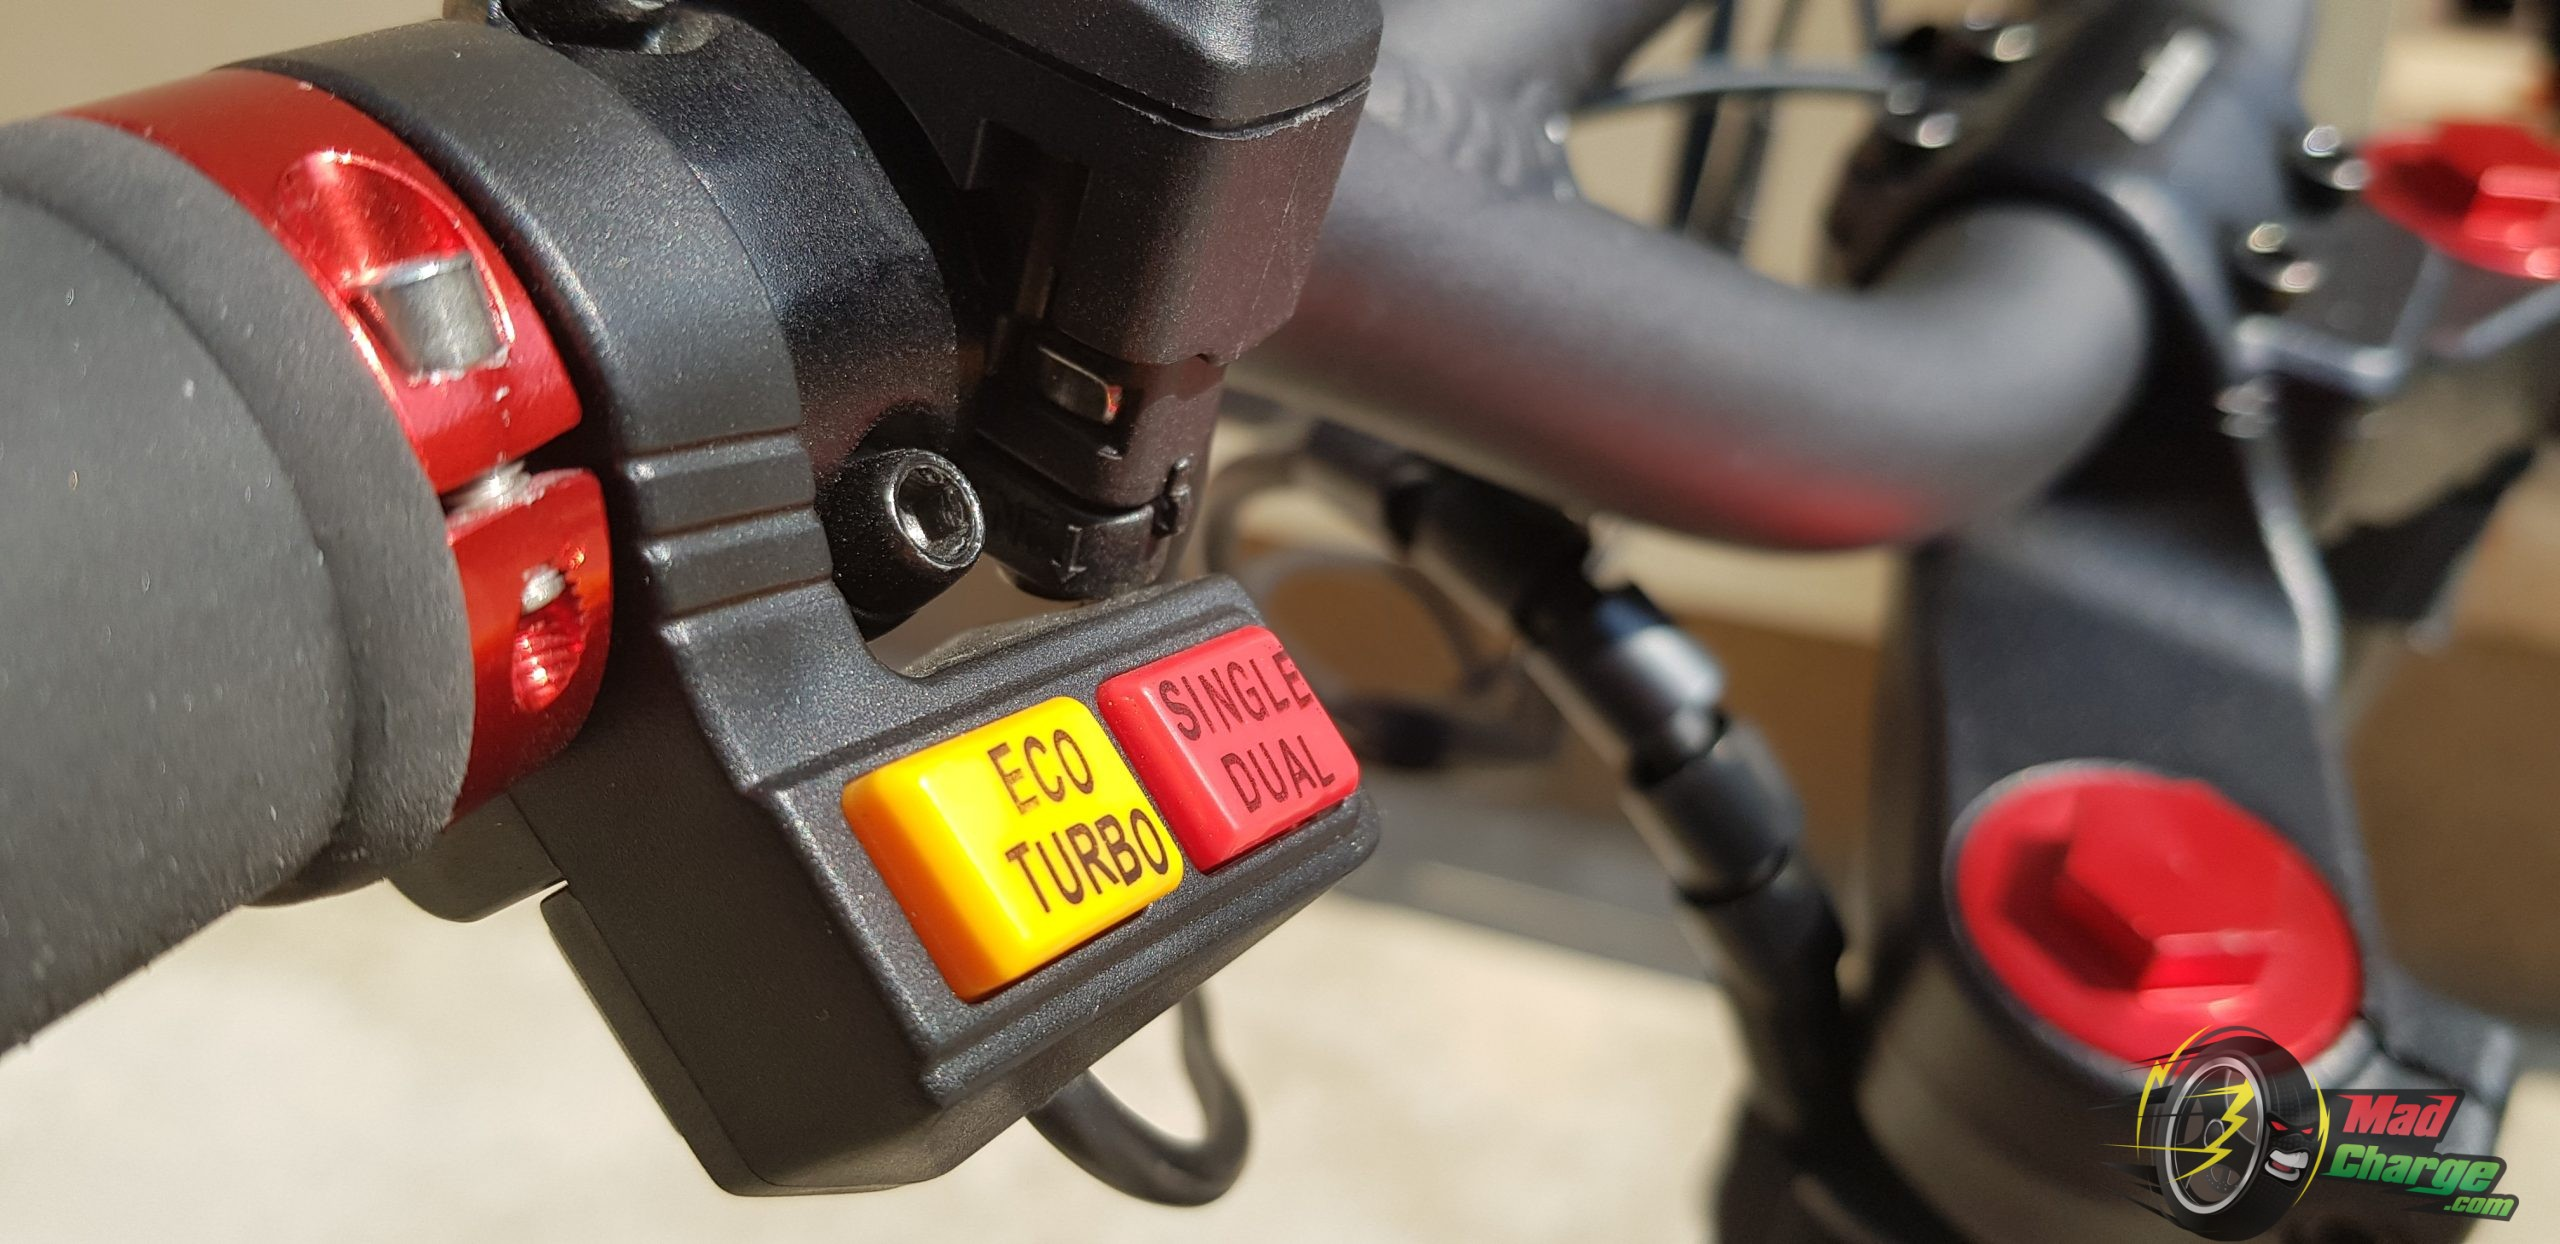 Kaabo Wolf Warrior II Eco Turbo Single Dual Buttons